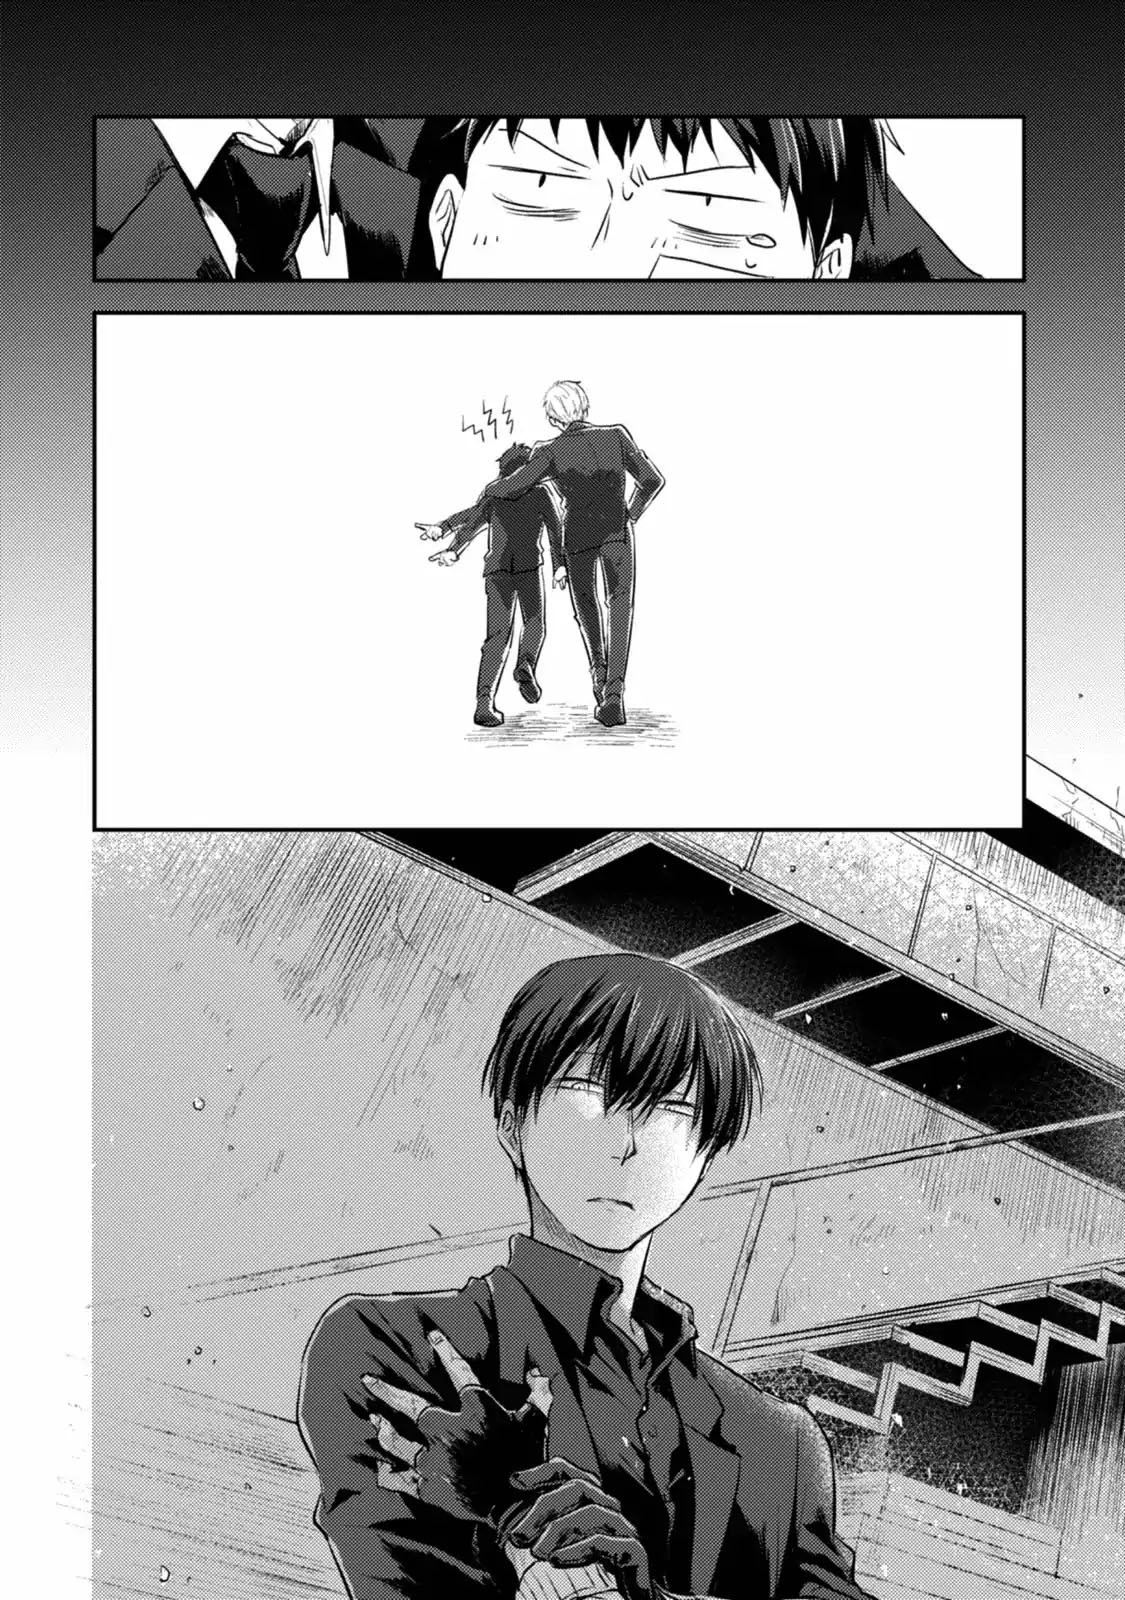 https://c9.mangatag.com/es_manga/pic5/14/21518/730317/138f45ac169b9d1115c5855b584cbb46.jpg Page 12